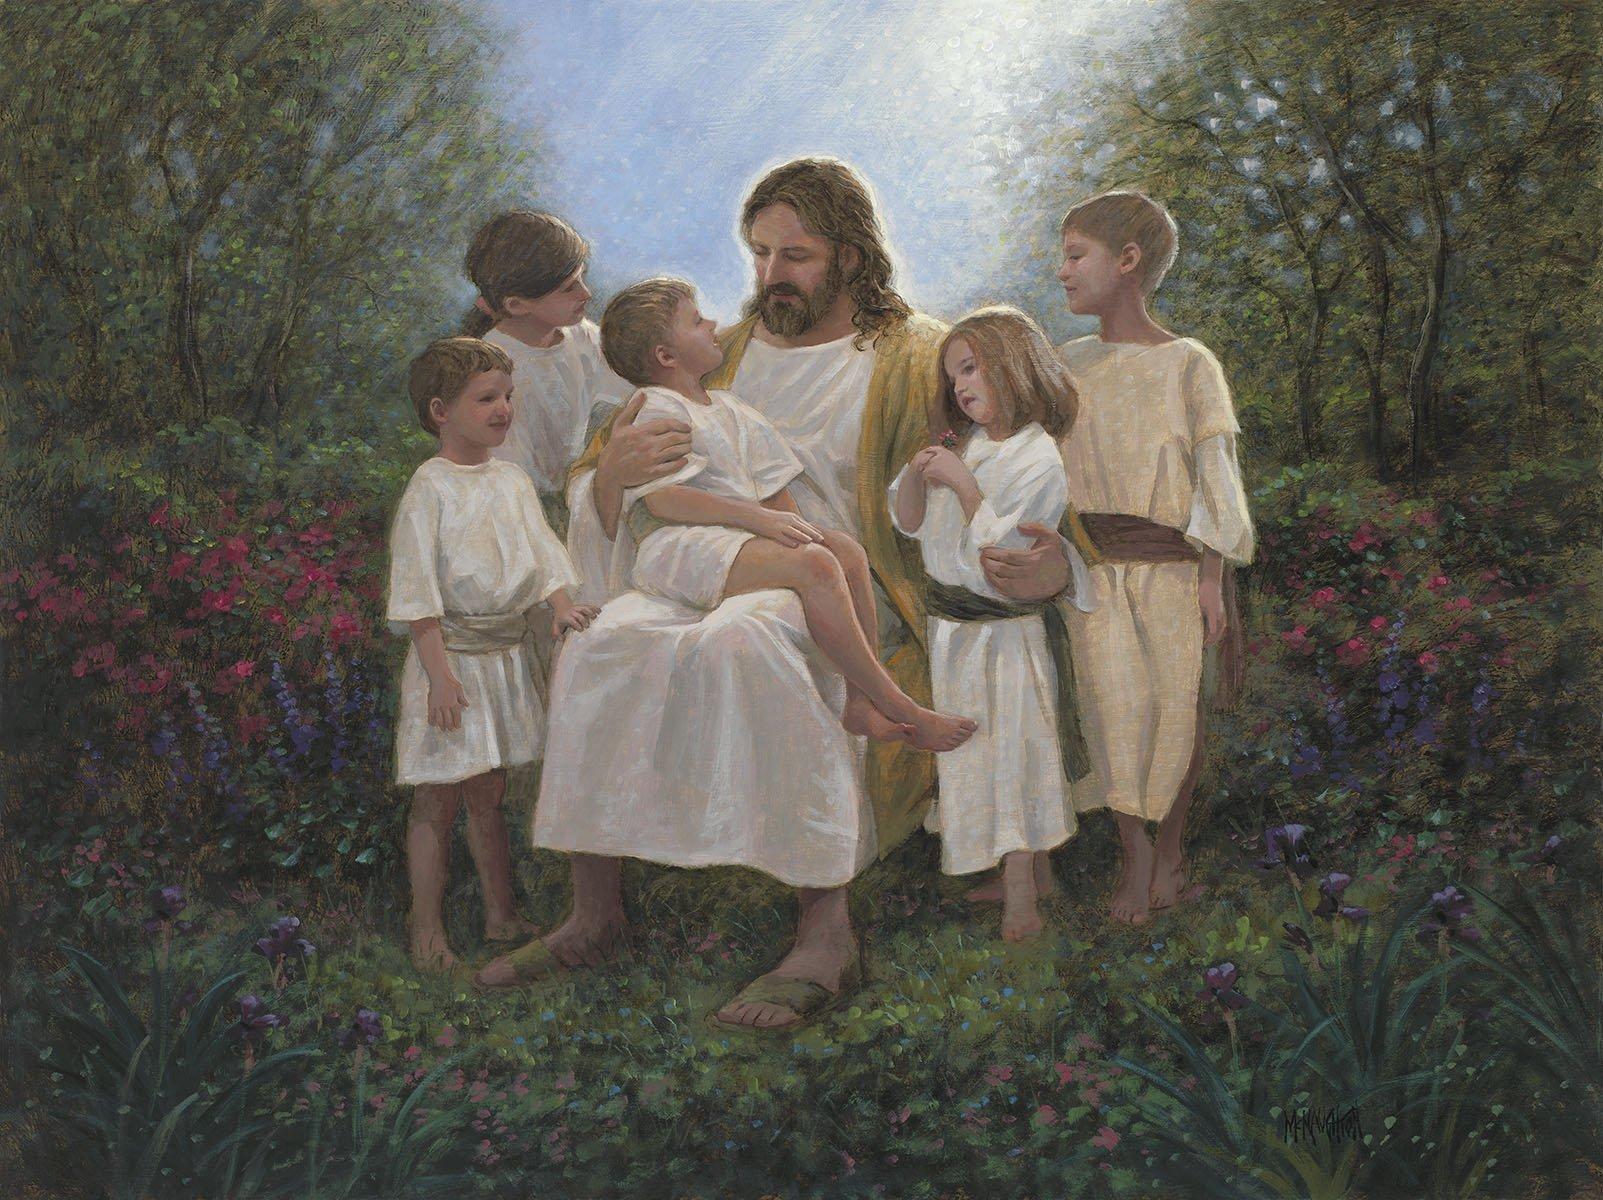 Jesus & the Children 3761 Panel